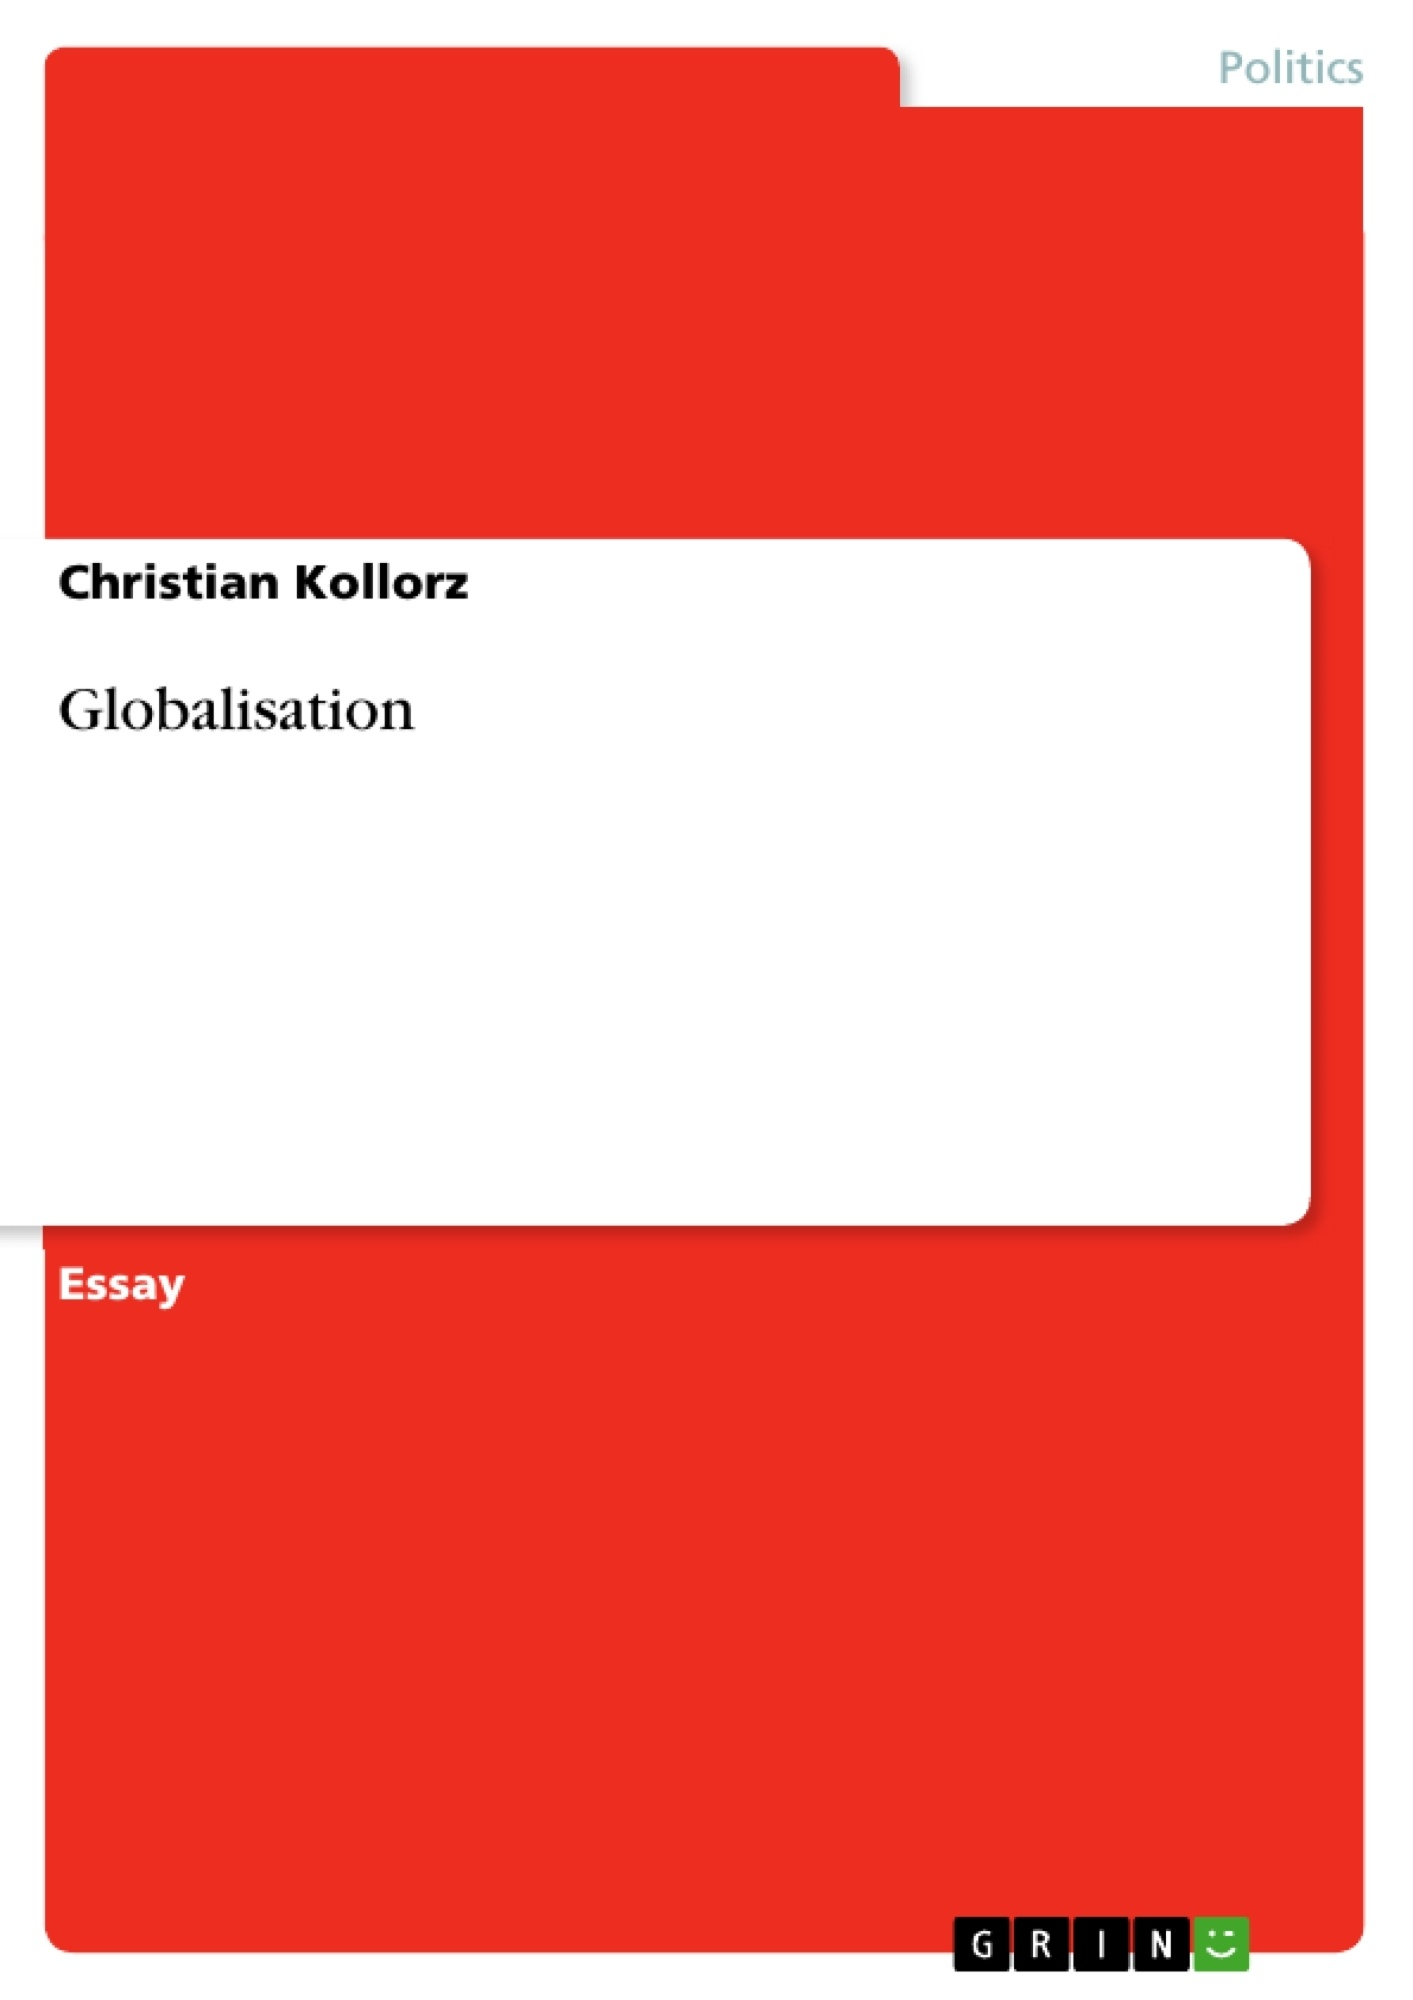 Title: Globalisation